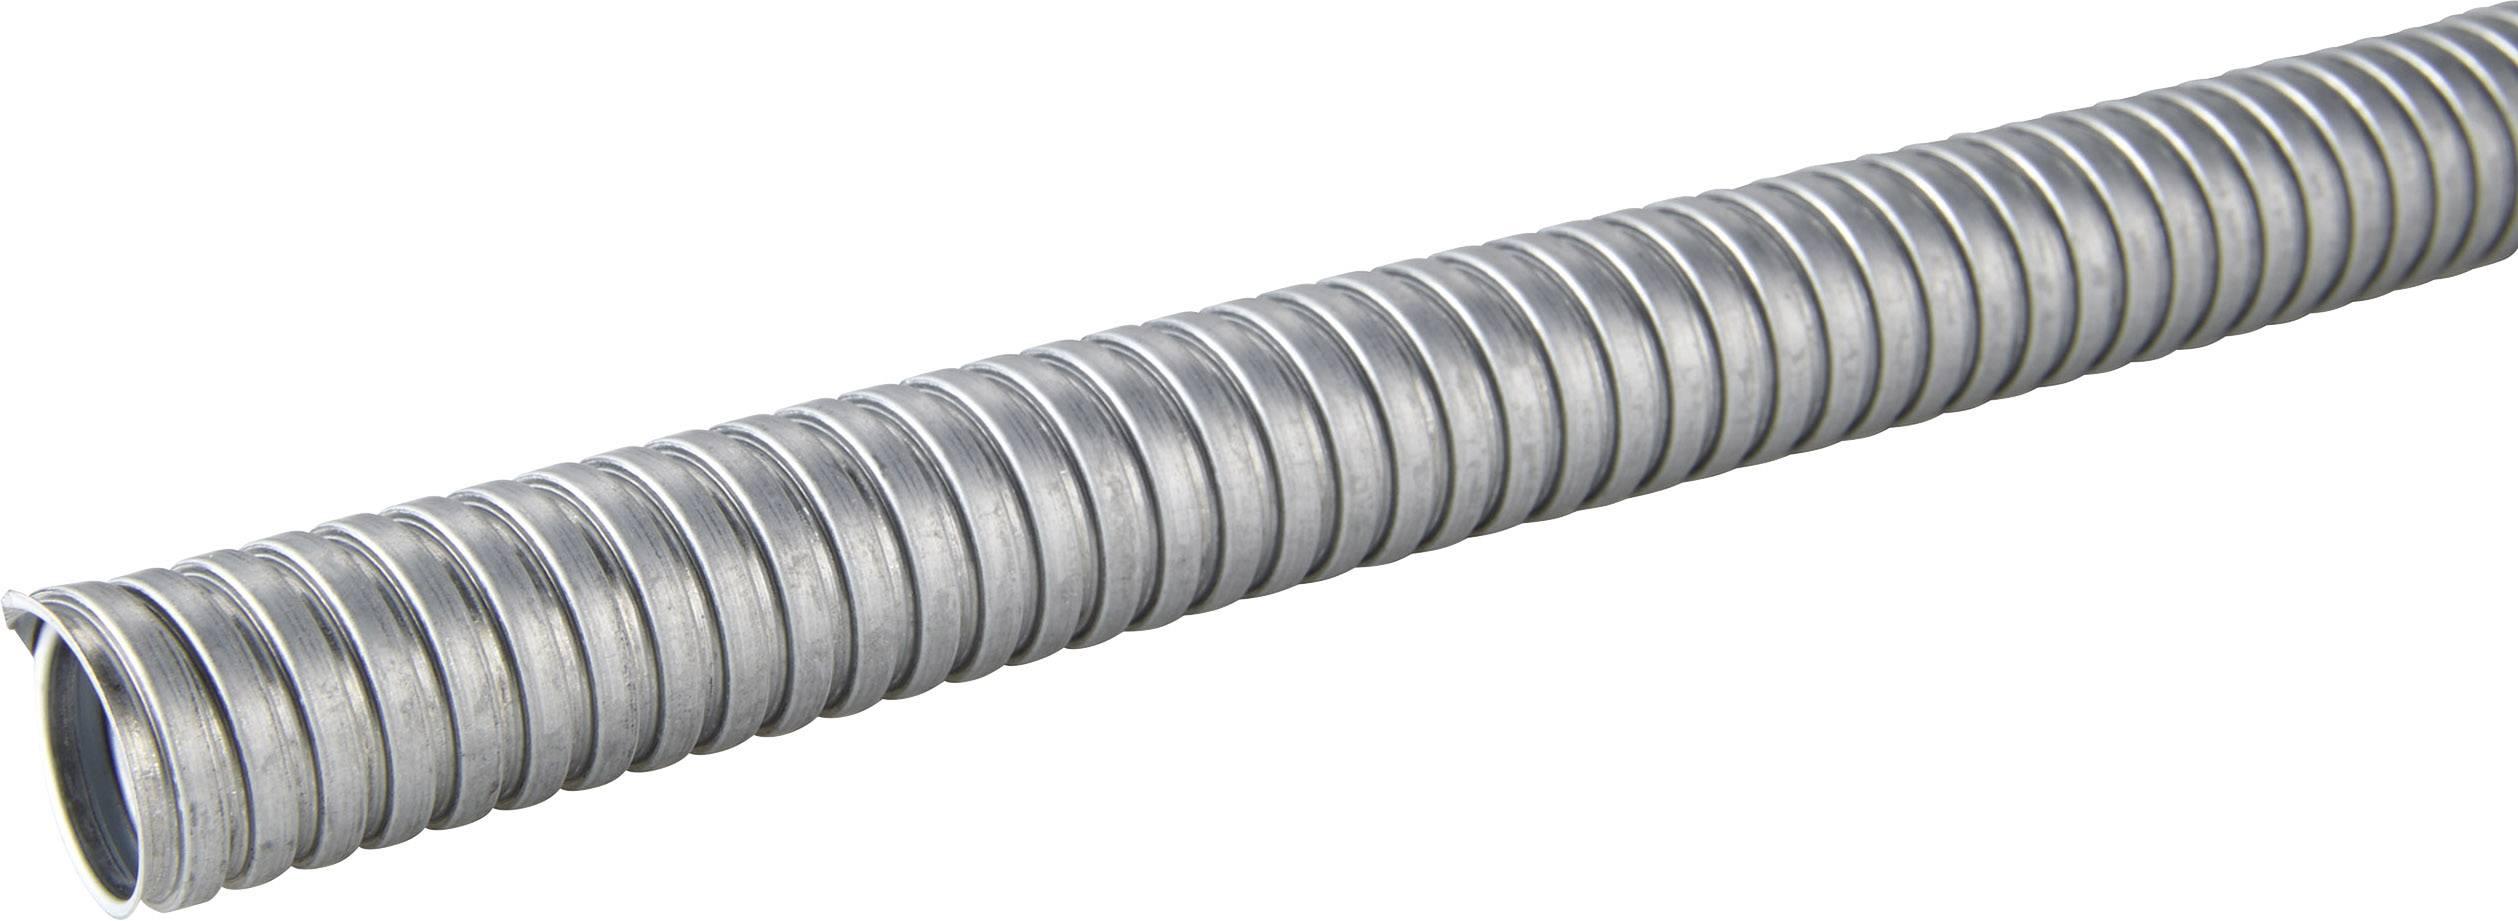 Ochranná hadice na kov LAPP SILVYN® AS 21/23x27 61802130, stříbrná, 50 m